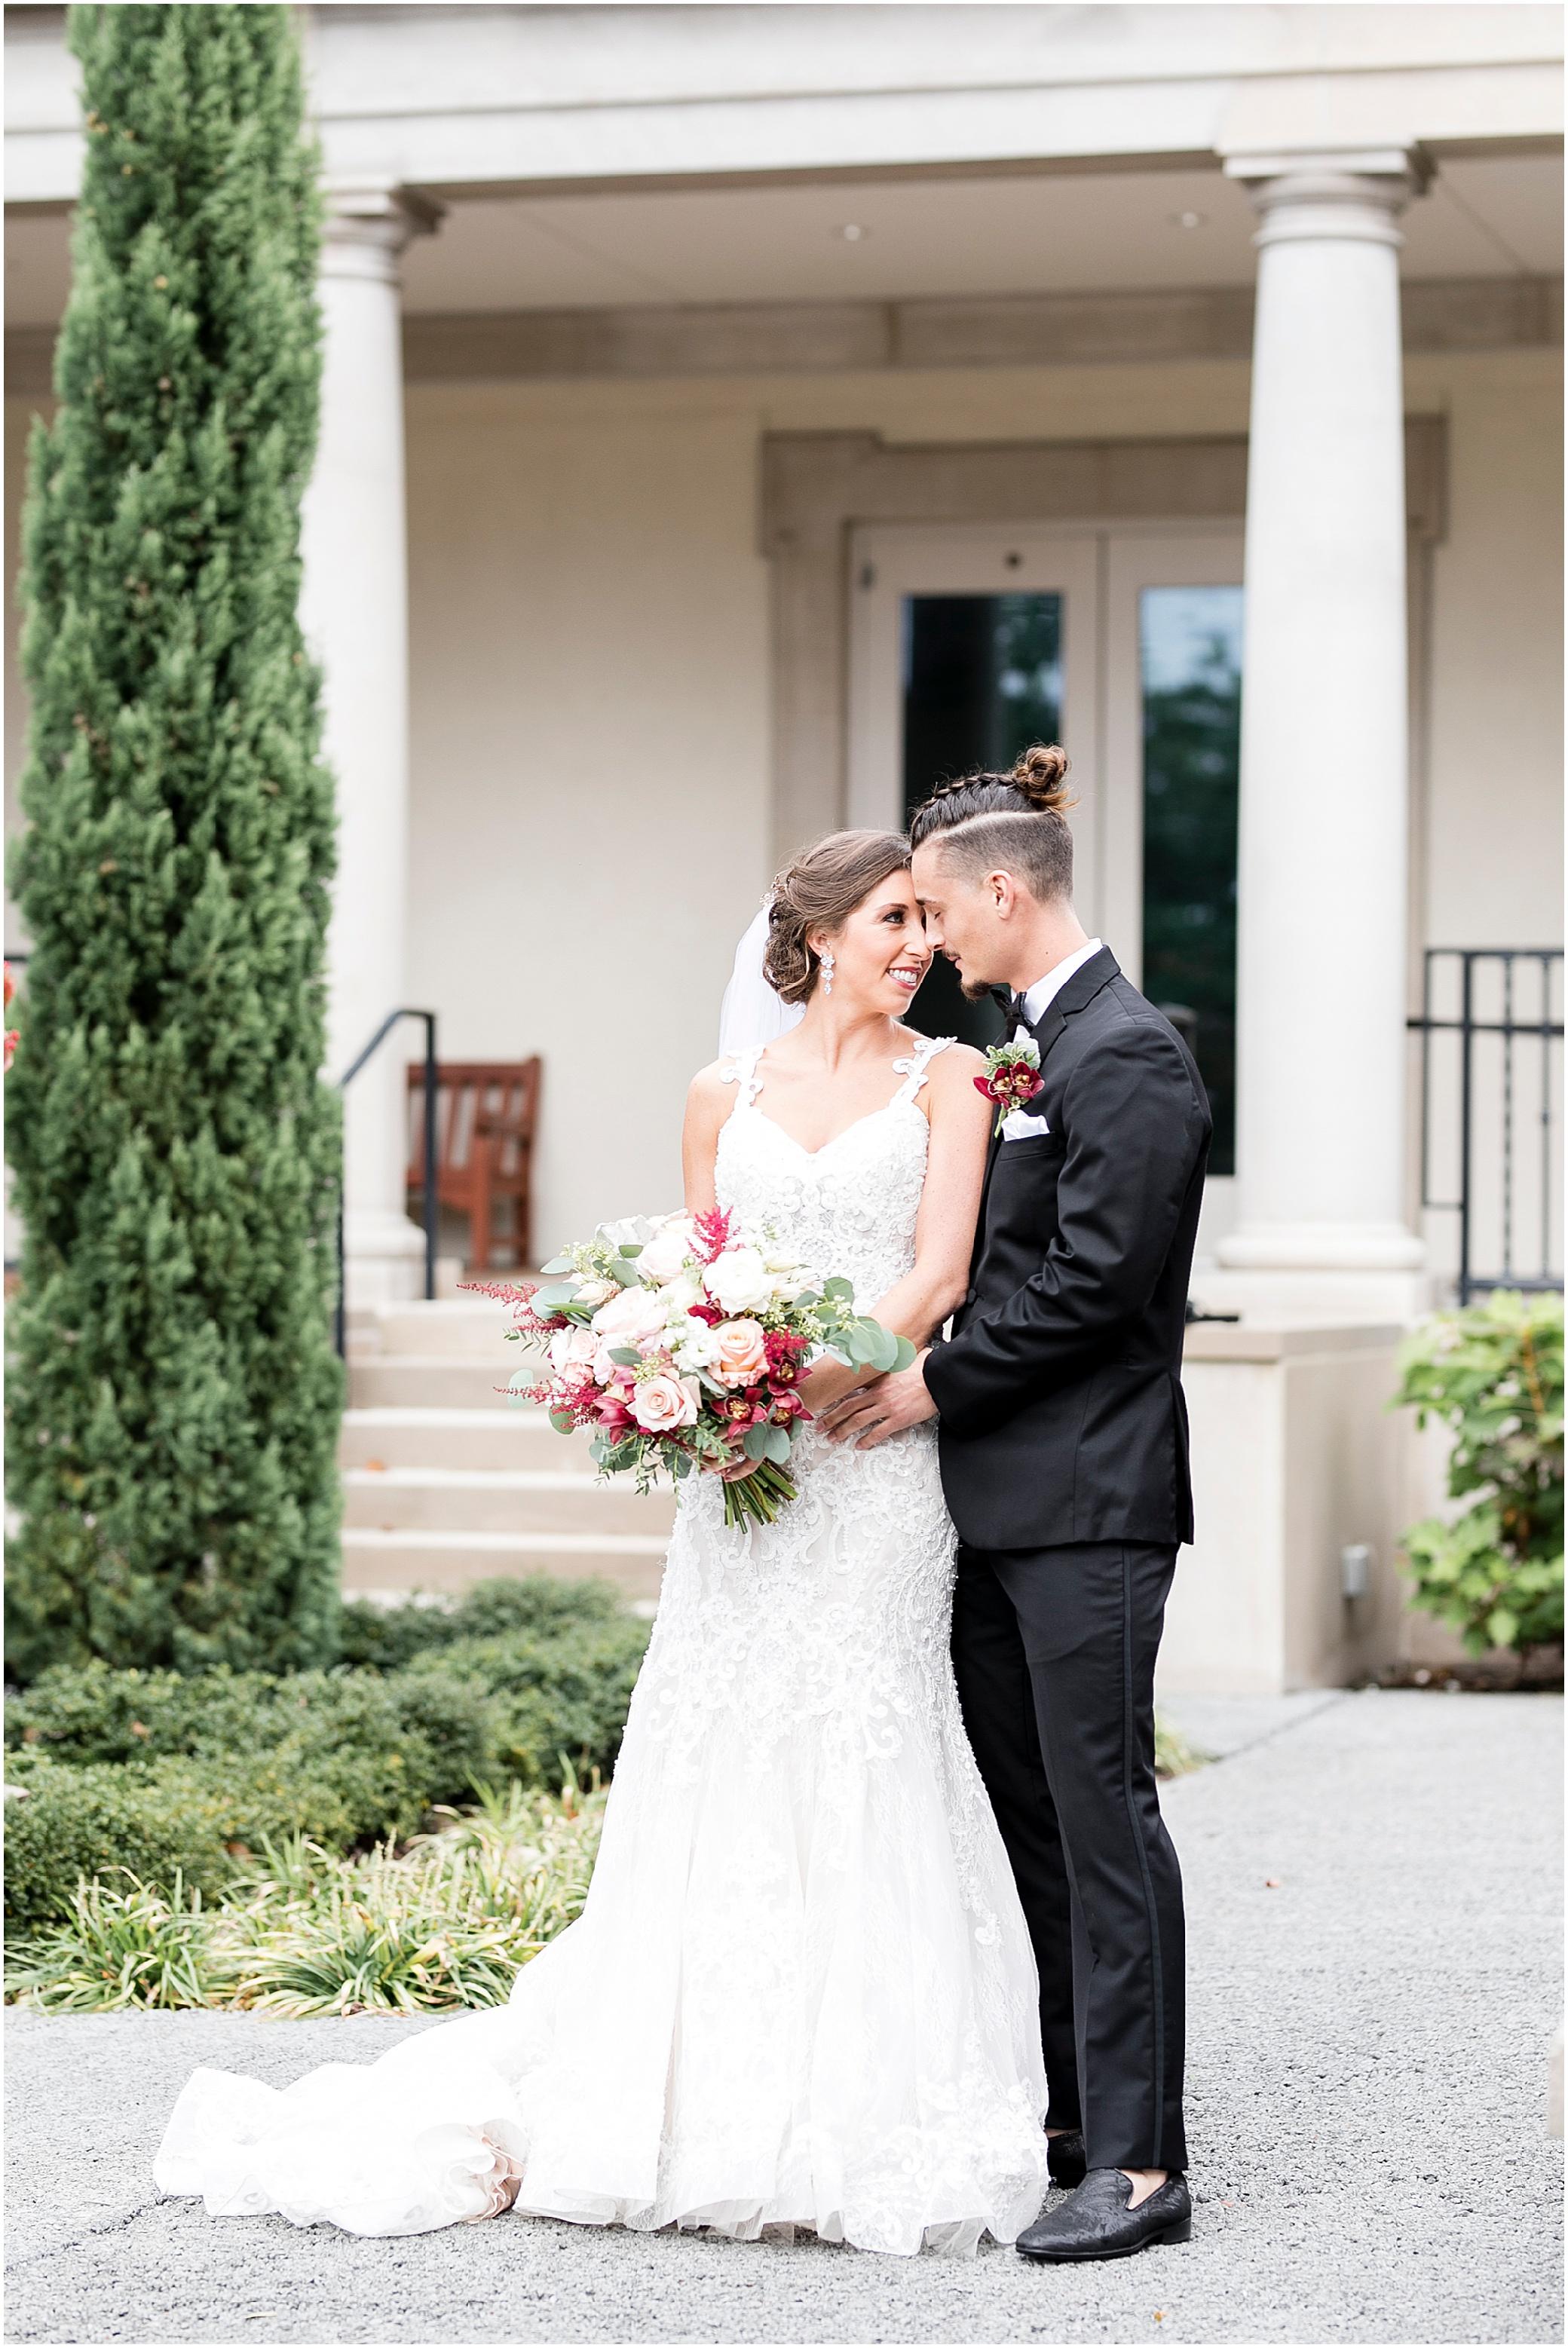 the chrysler museum wedding, the chrysler museum wedding photography, norfolk wedding photography, virginia wedding photography, jessica ryan photography, jessica ryan photographer, richmond wedding photographer,